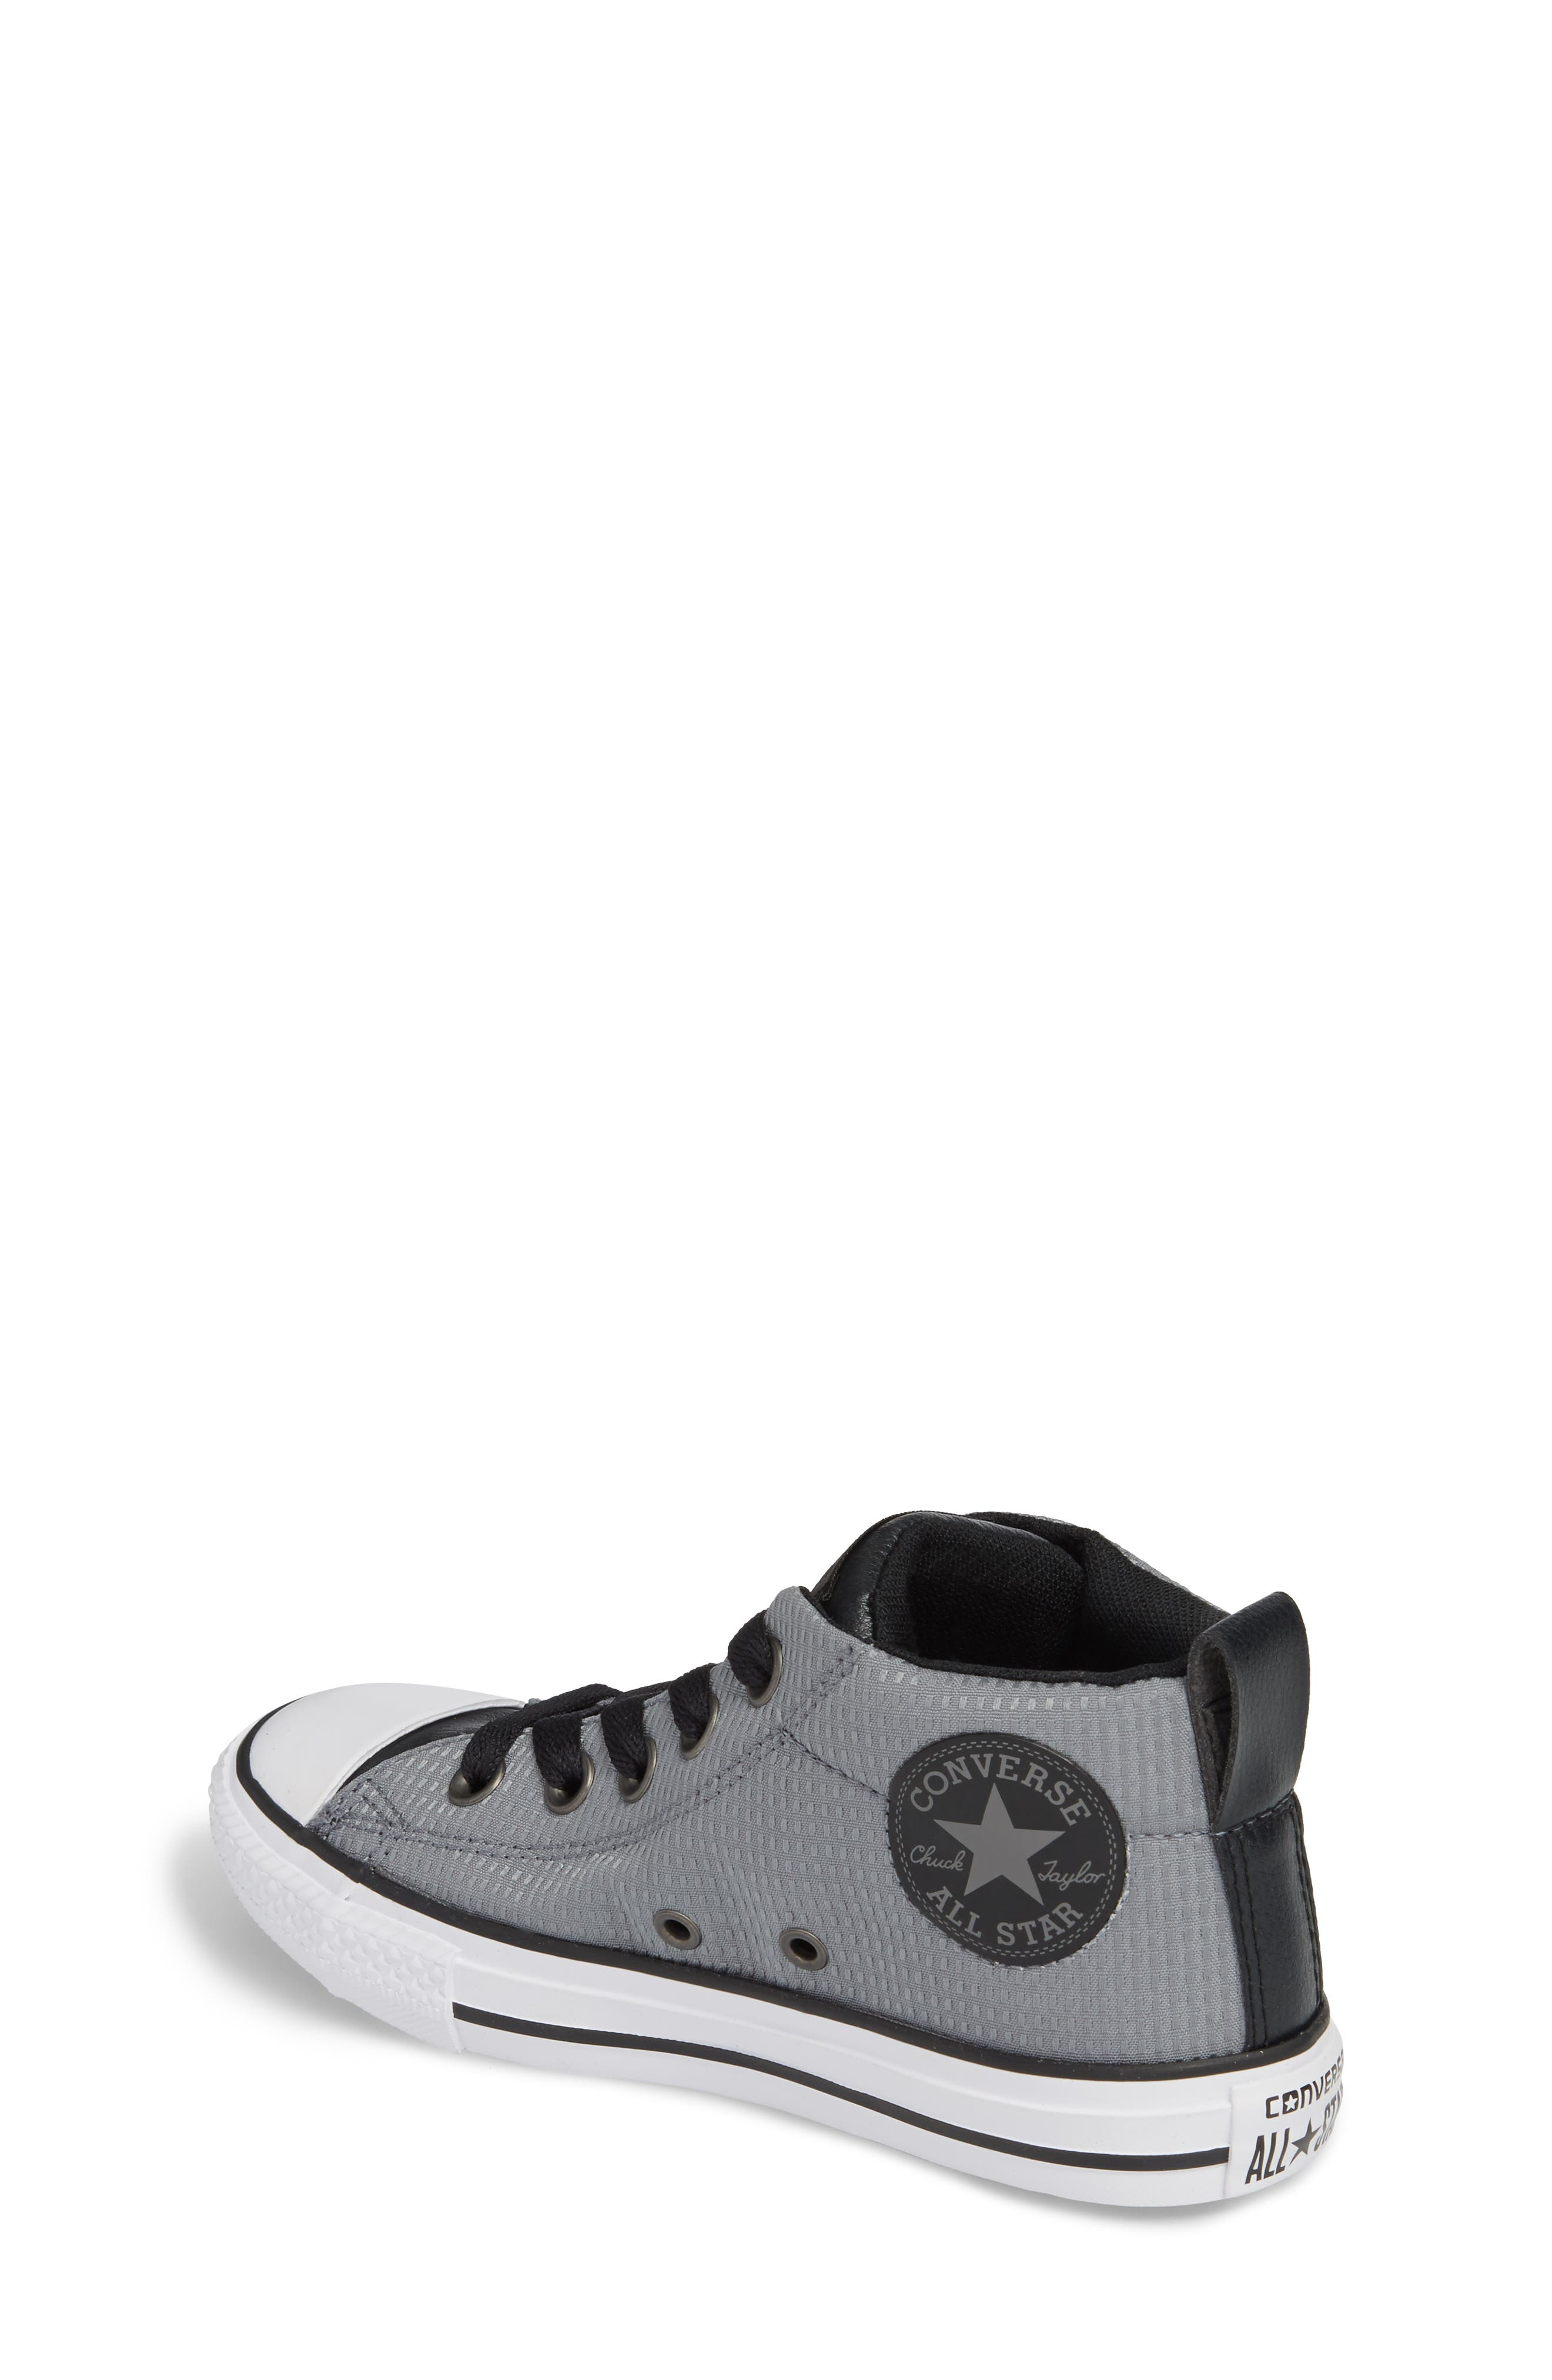 Alternate Image 2  - Converse Chuck Taylor® All Star® Street Mid Backpack Sneaker (Baby, Walker, Toddler, Little Kid & Big Kid)